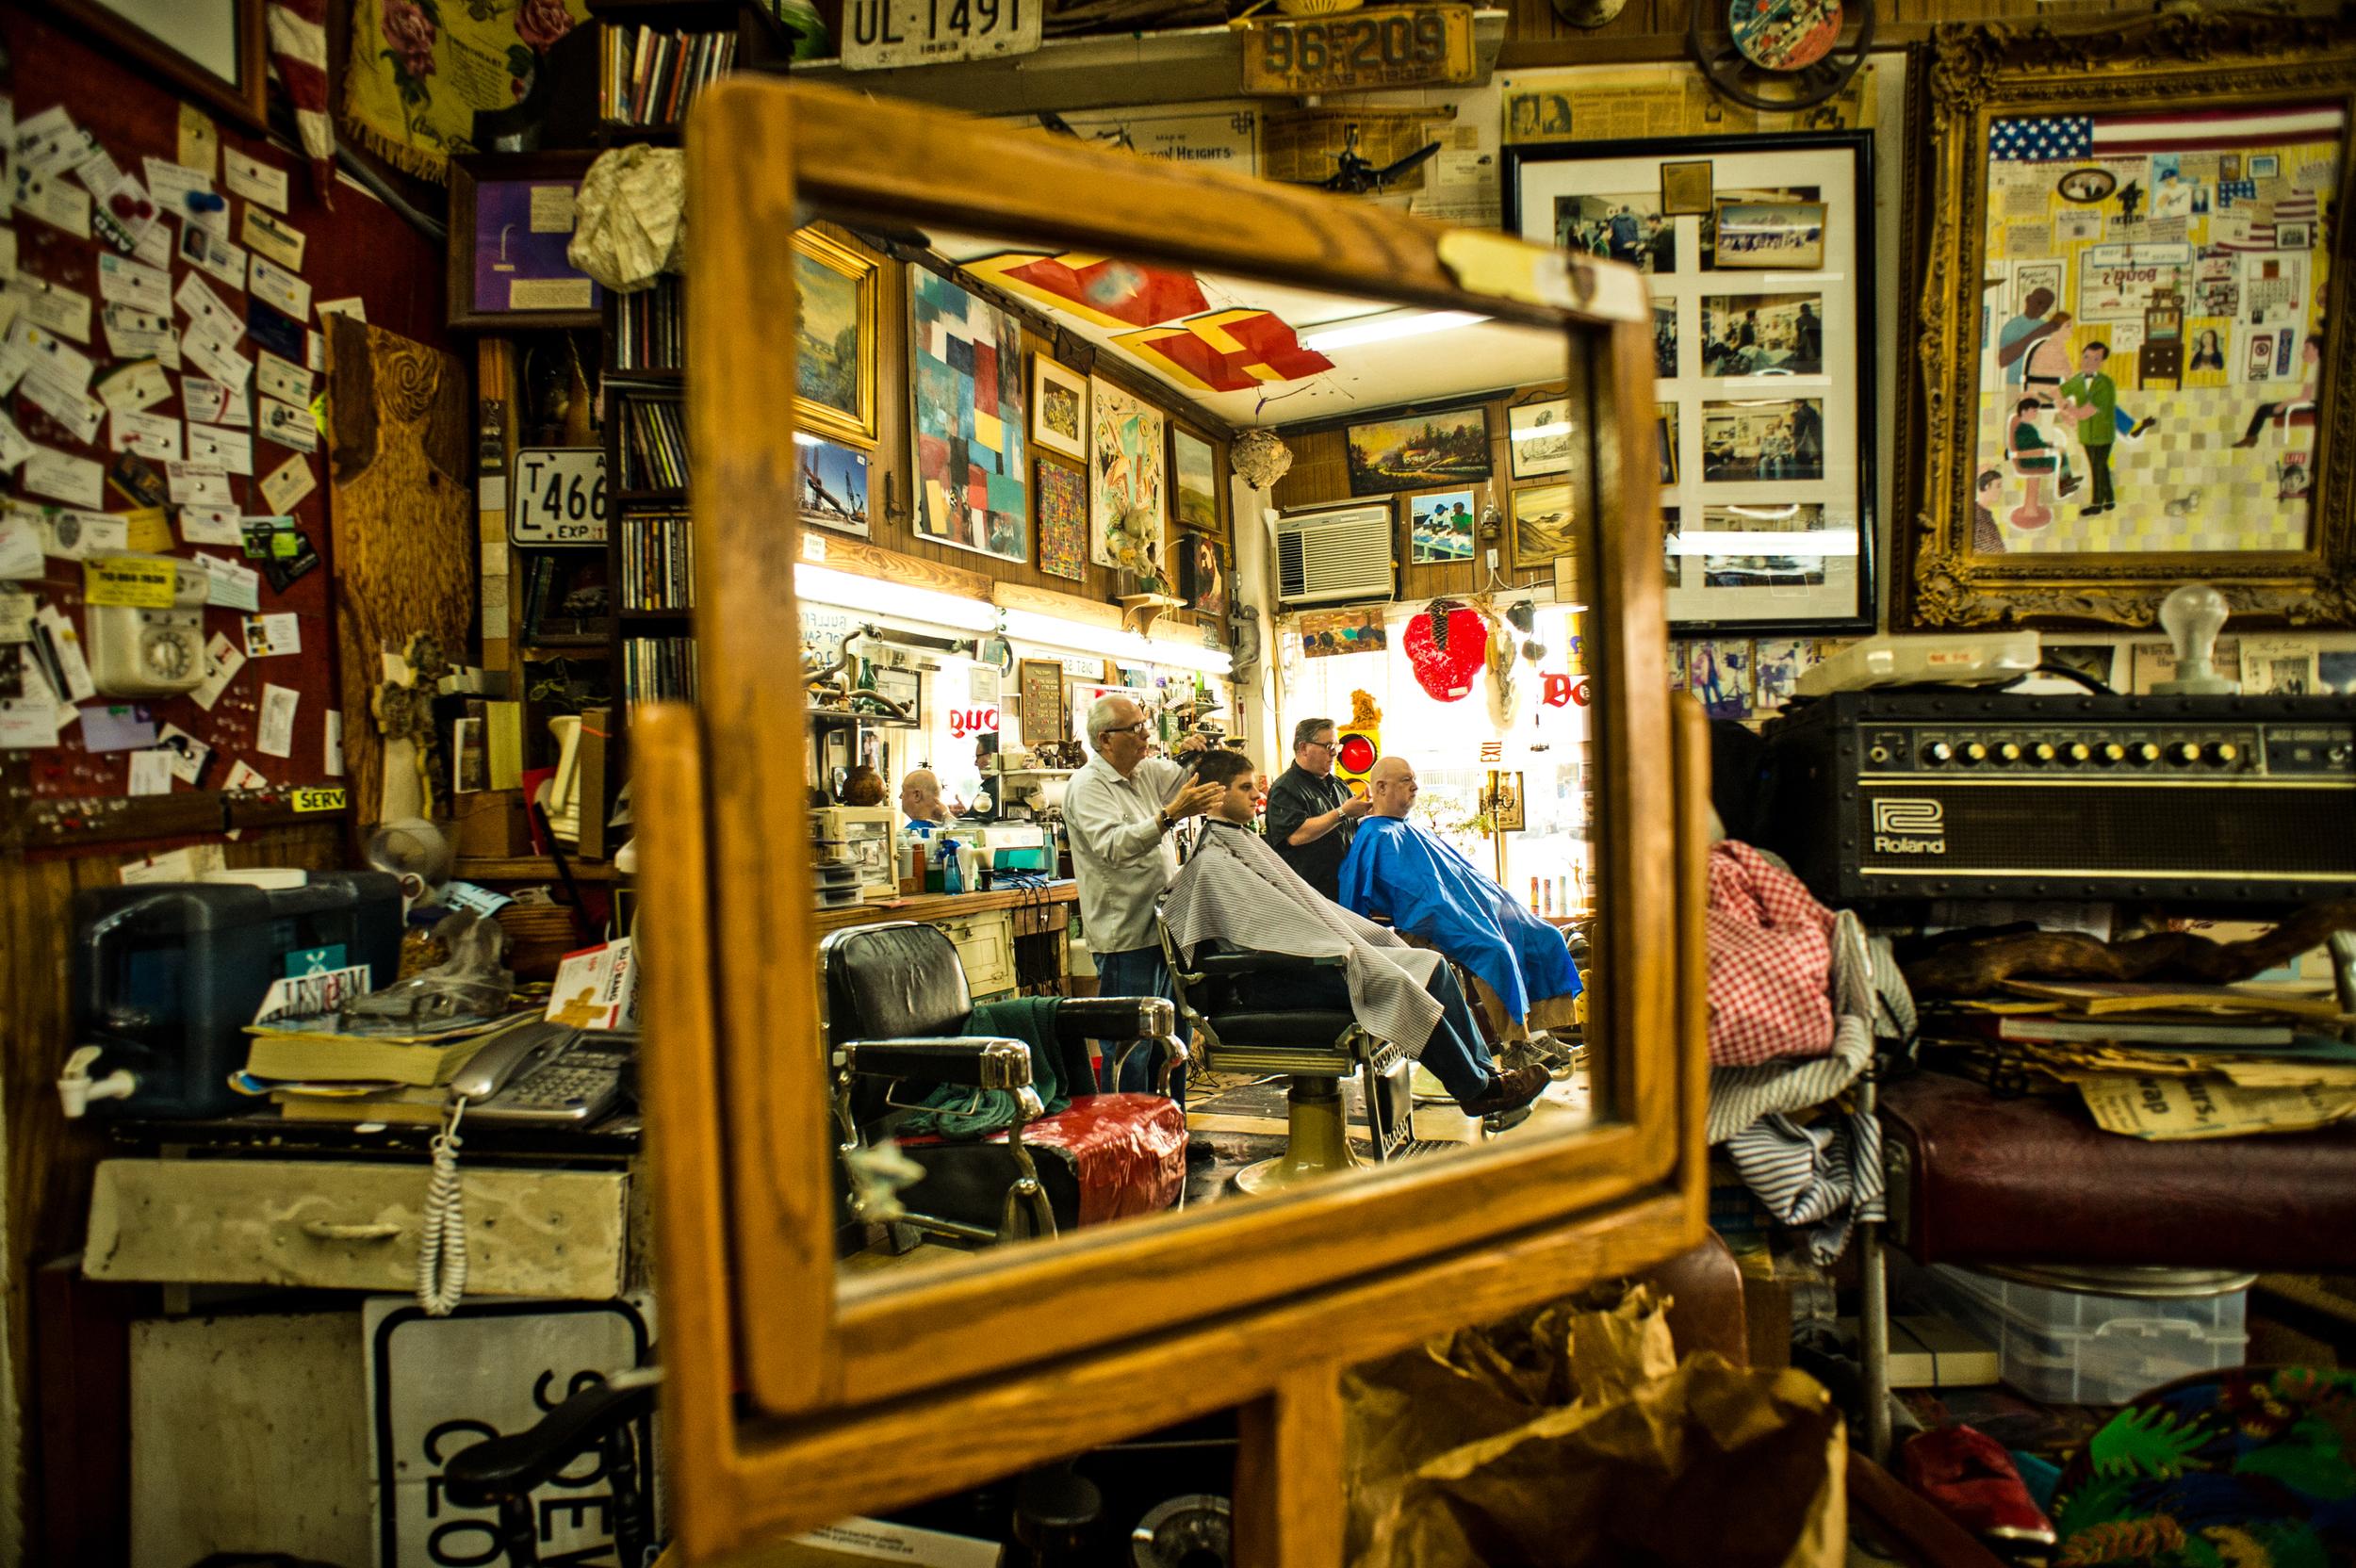 Doug's Barbershop in Houston, Texas© Rob Hammer